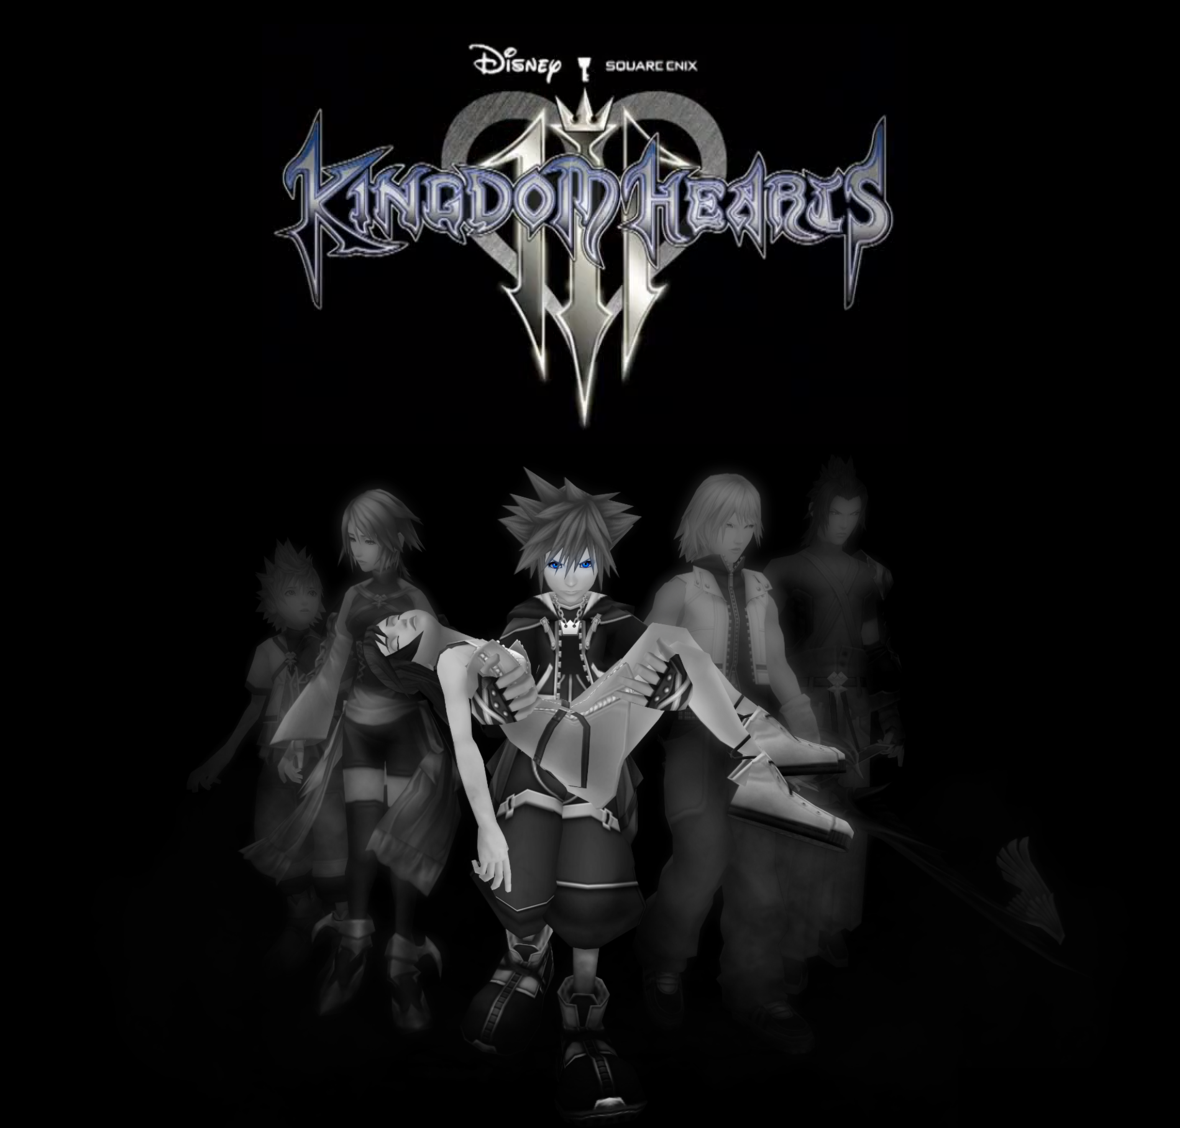 Fanmade Kingdom Hearts III poster